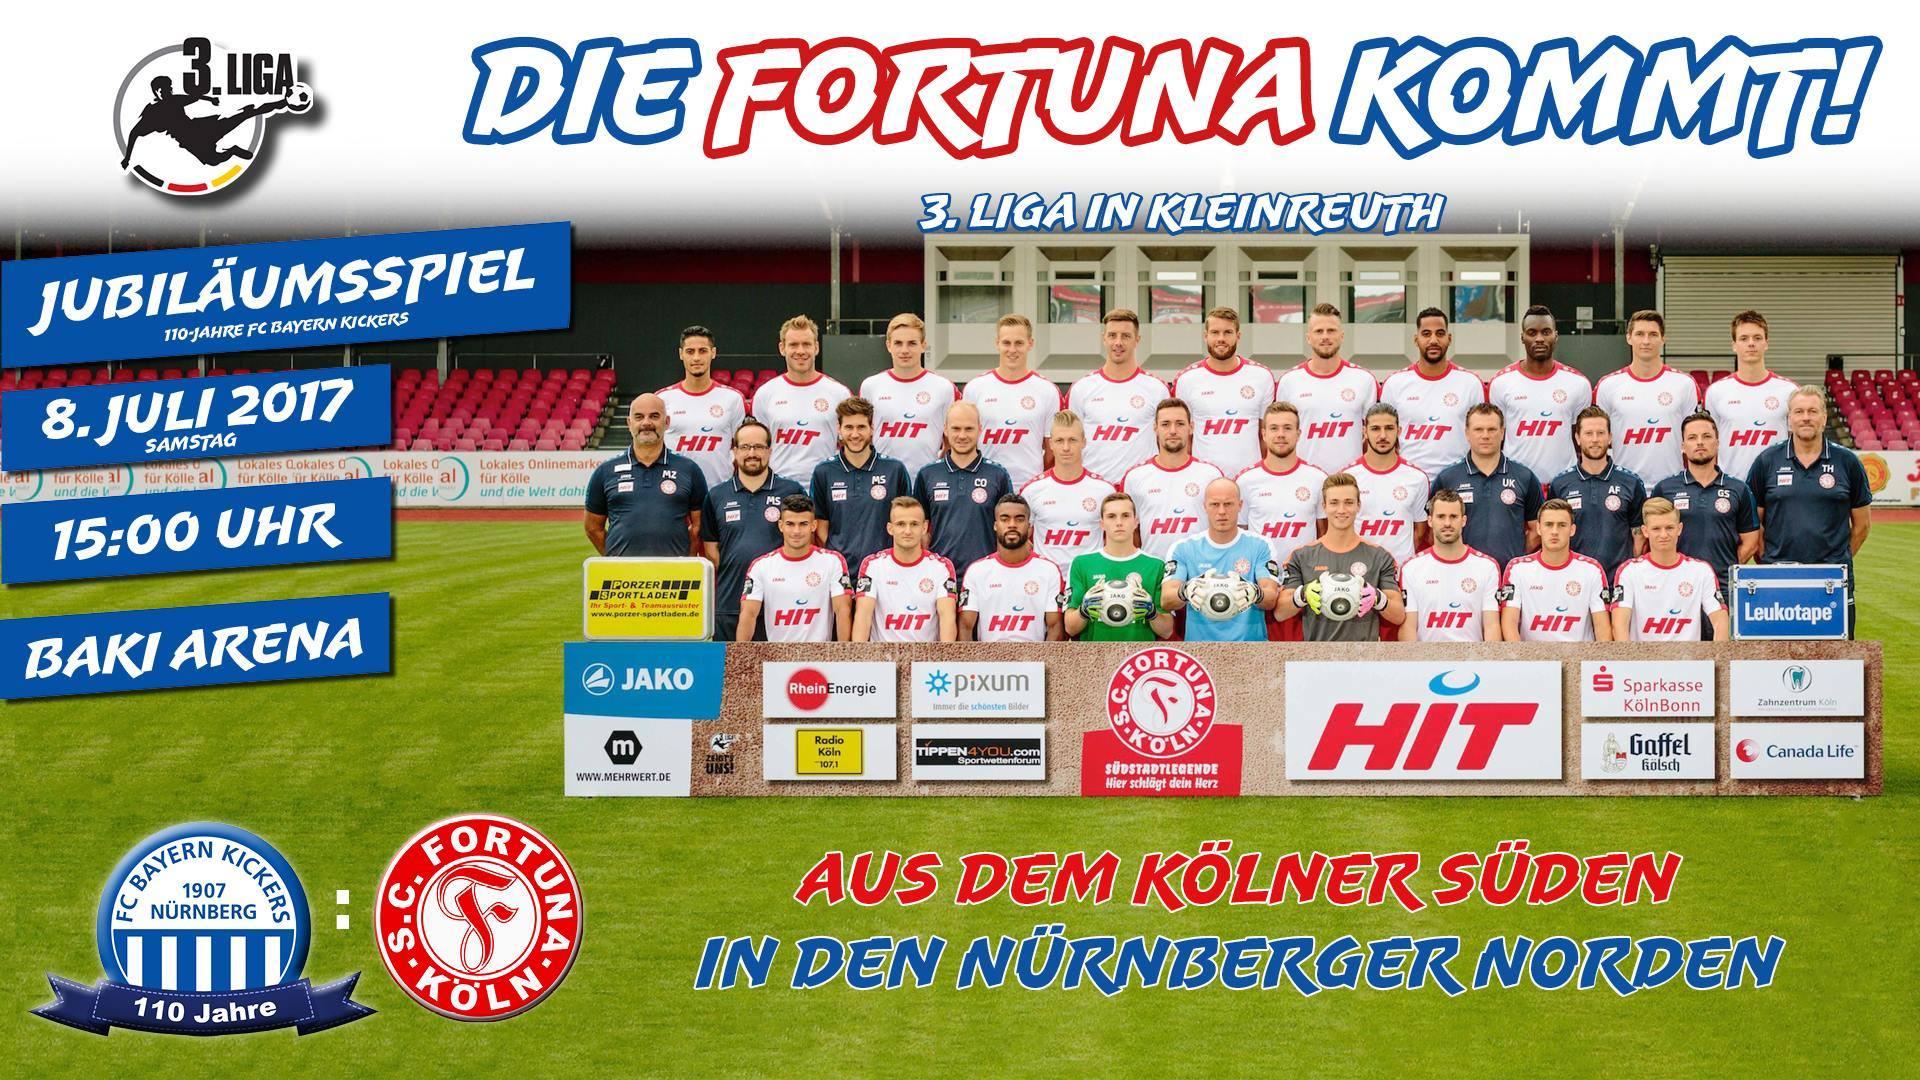 Fc Köln Vs Bayern München